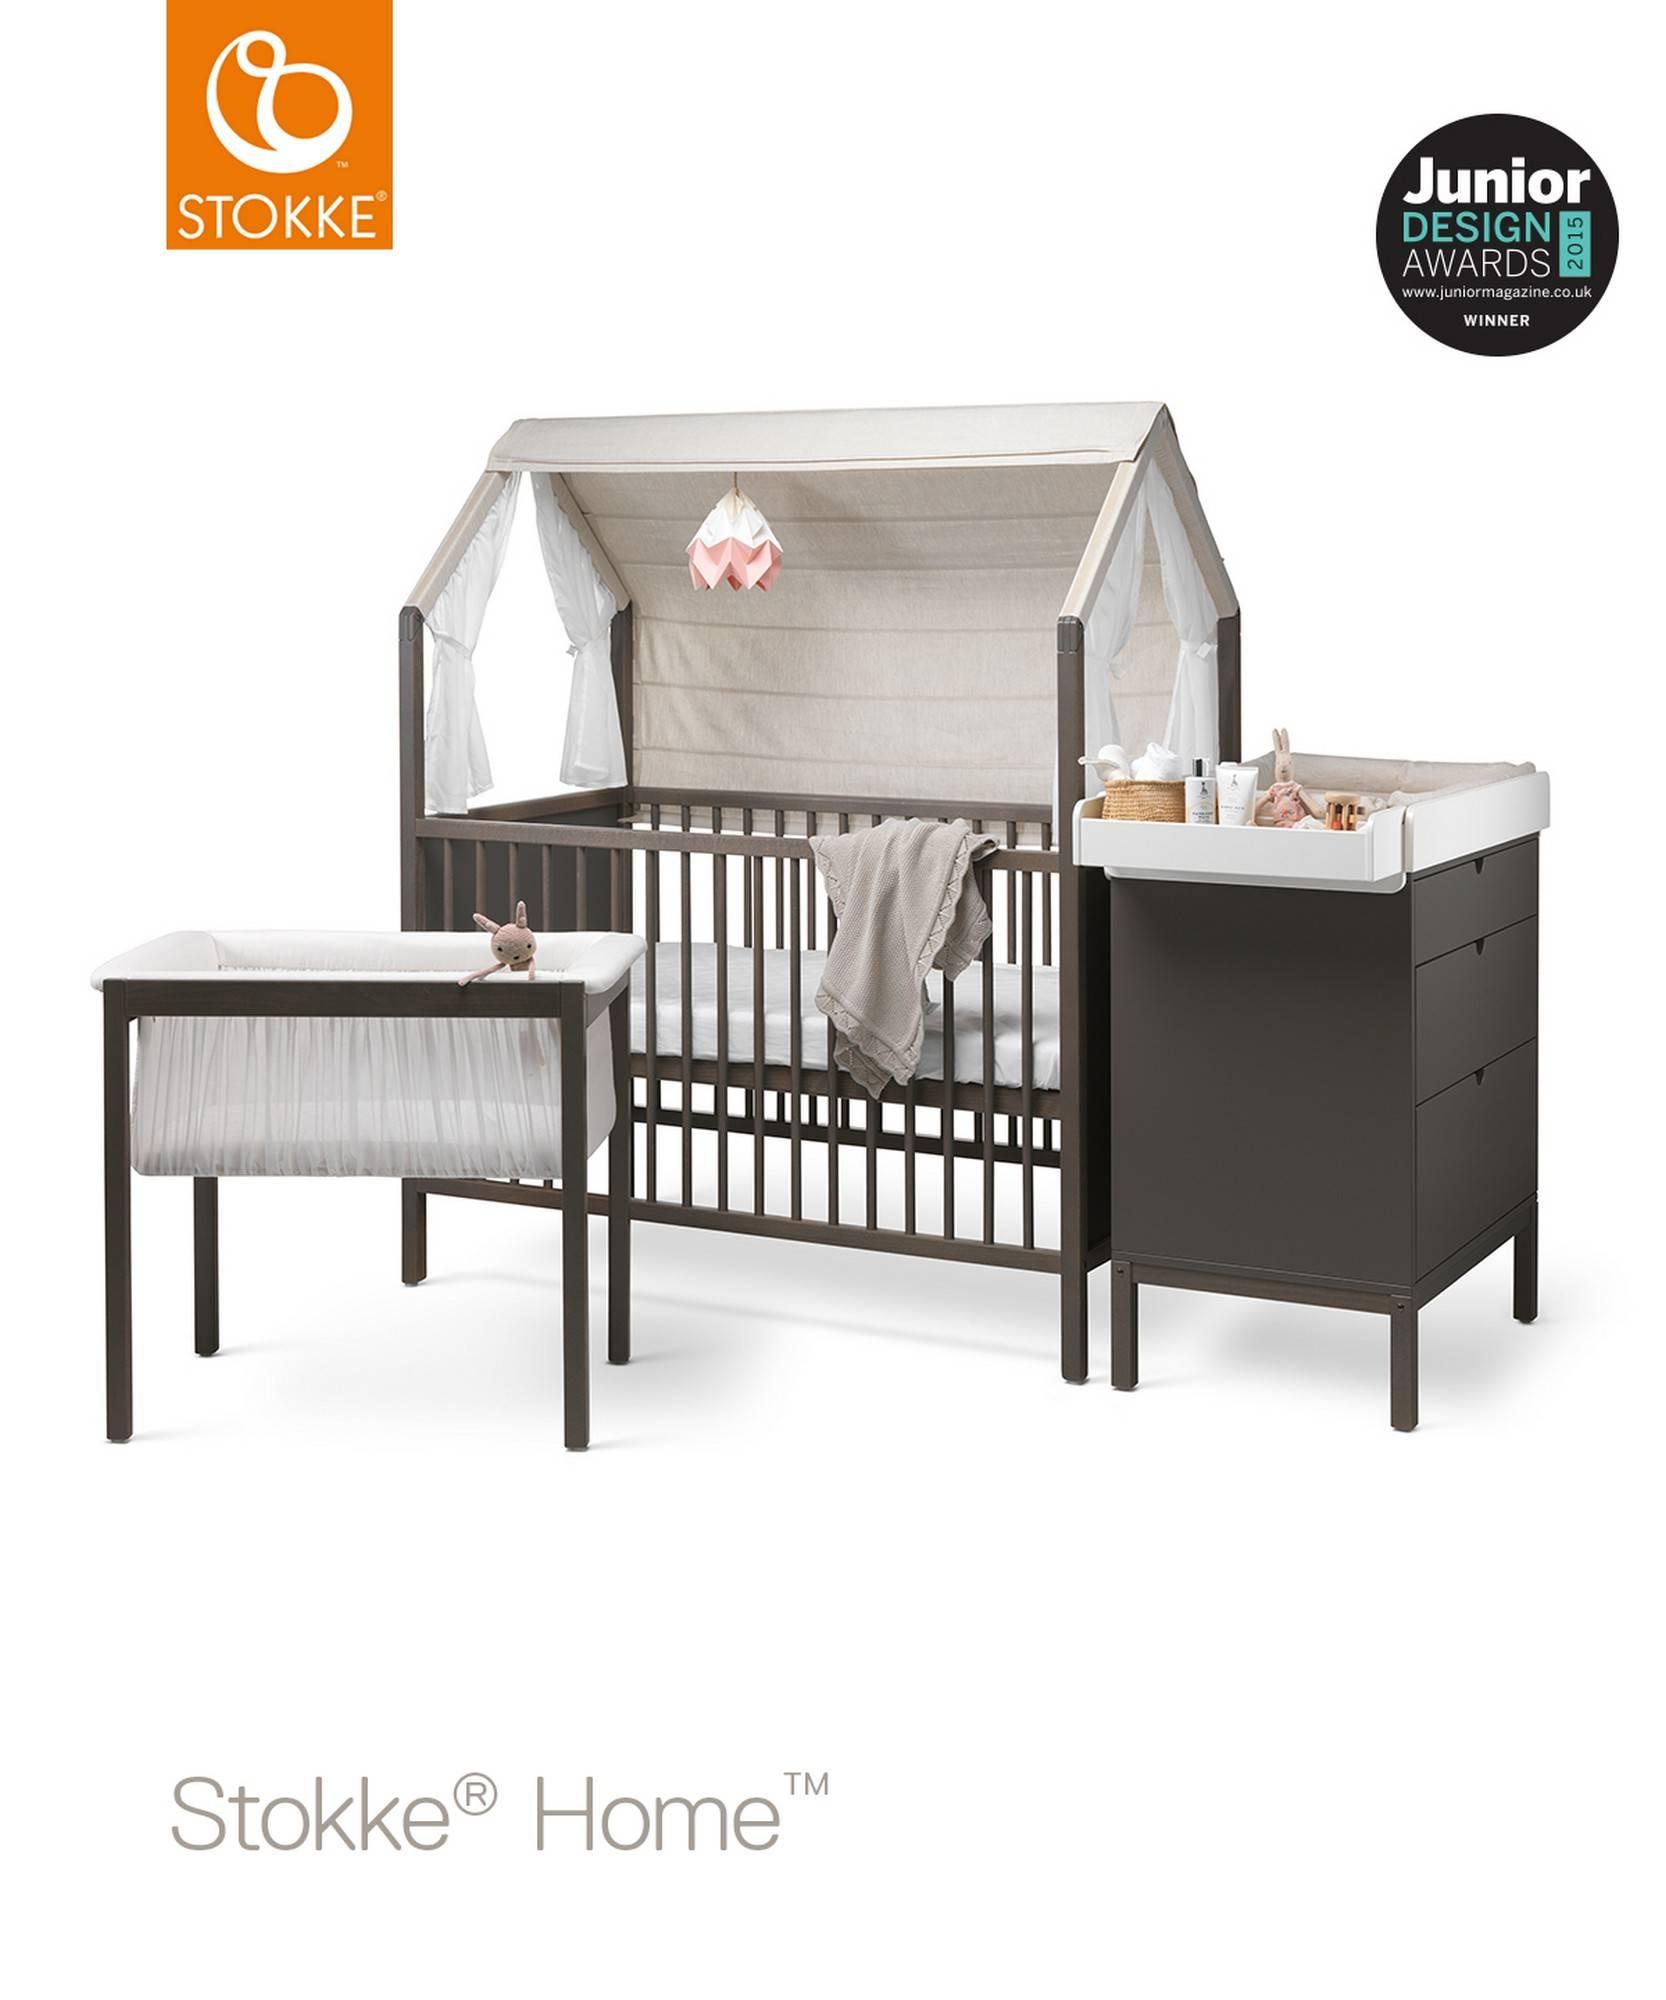 Hazy Grey Stokke Home Cradle